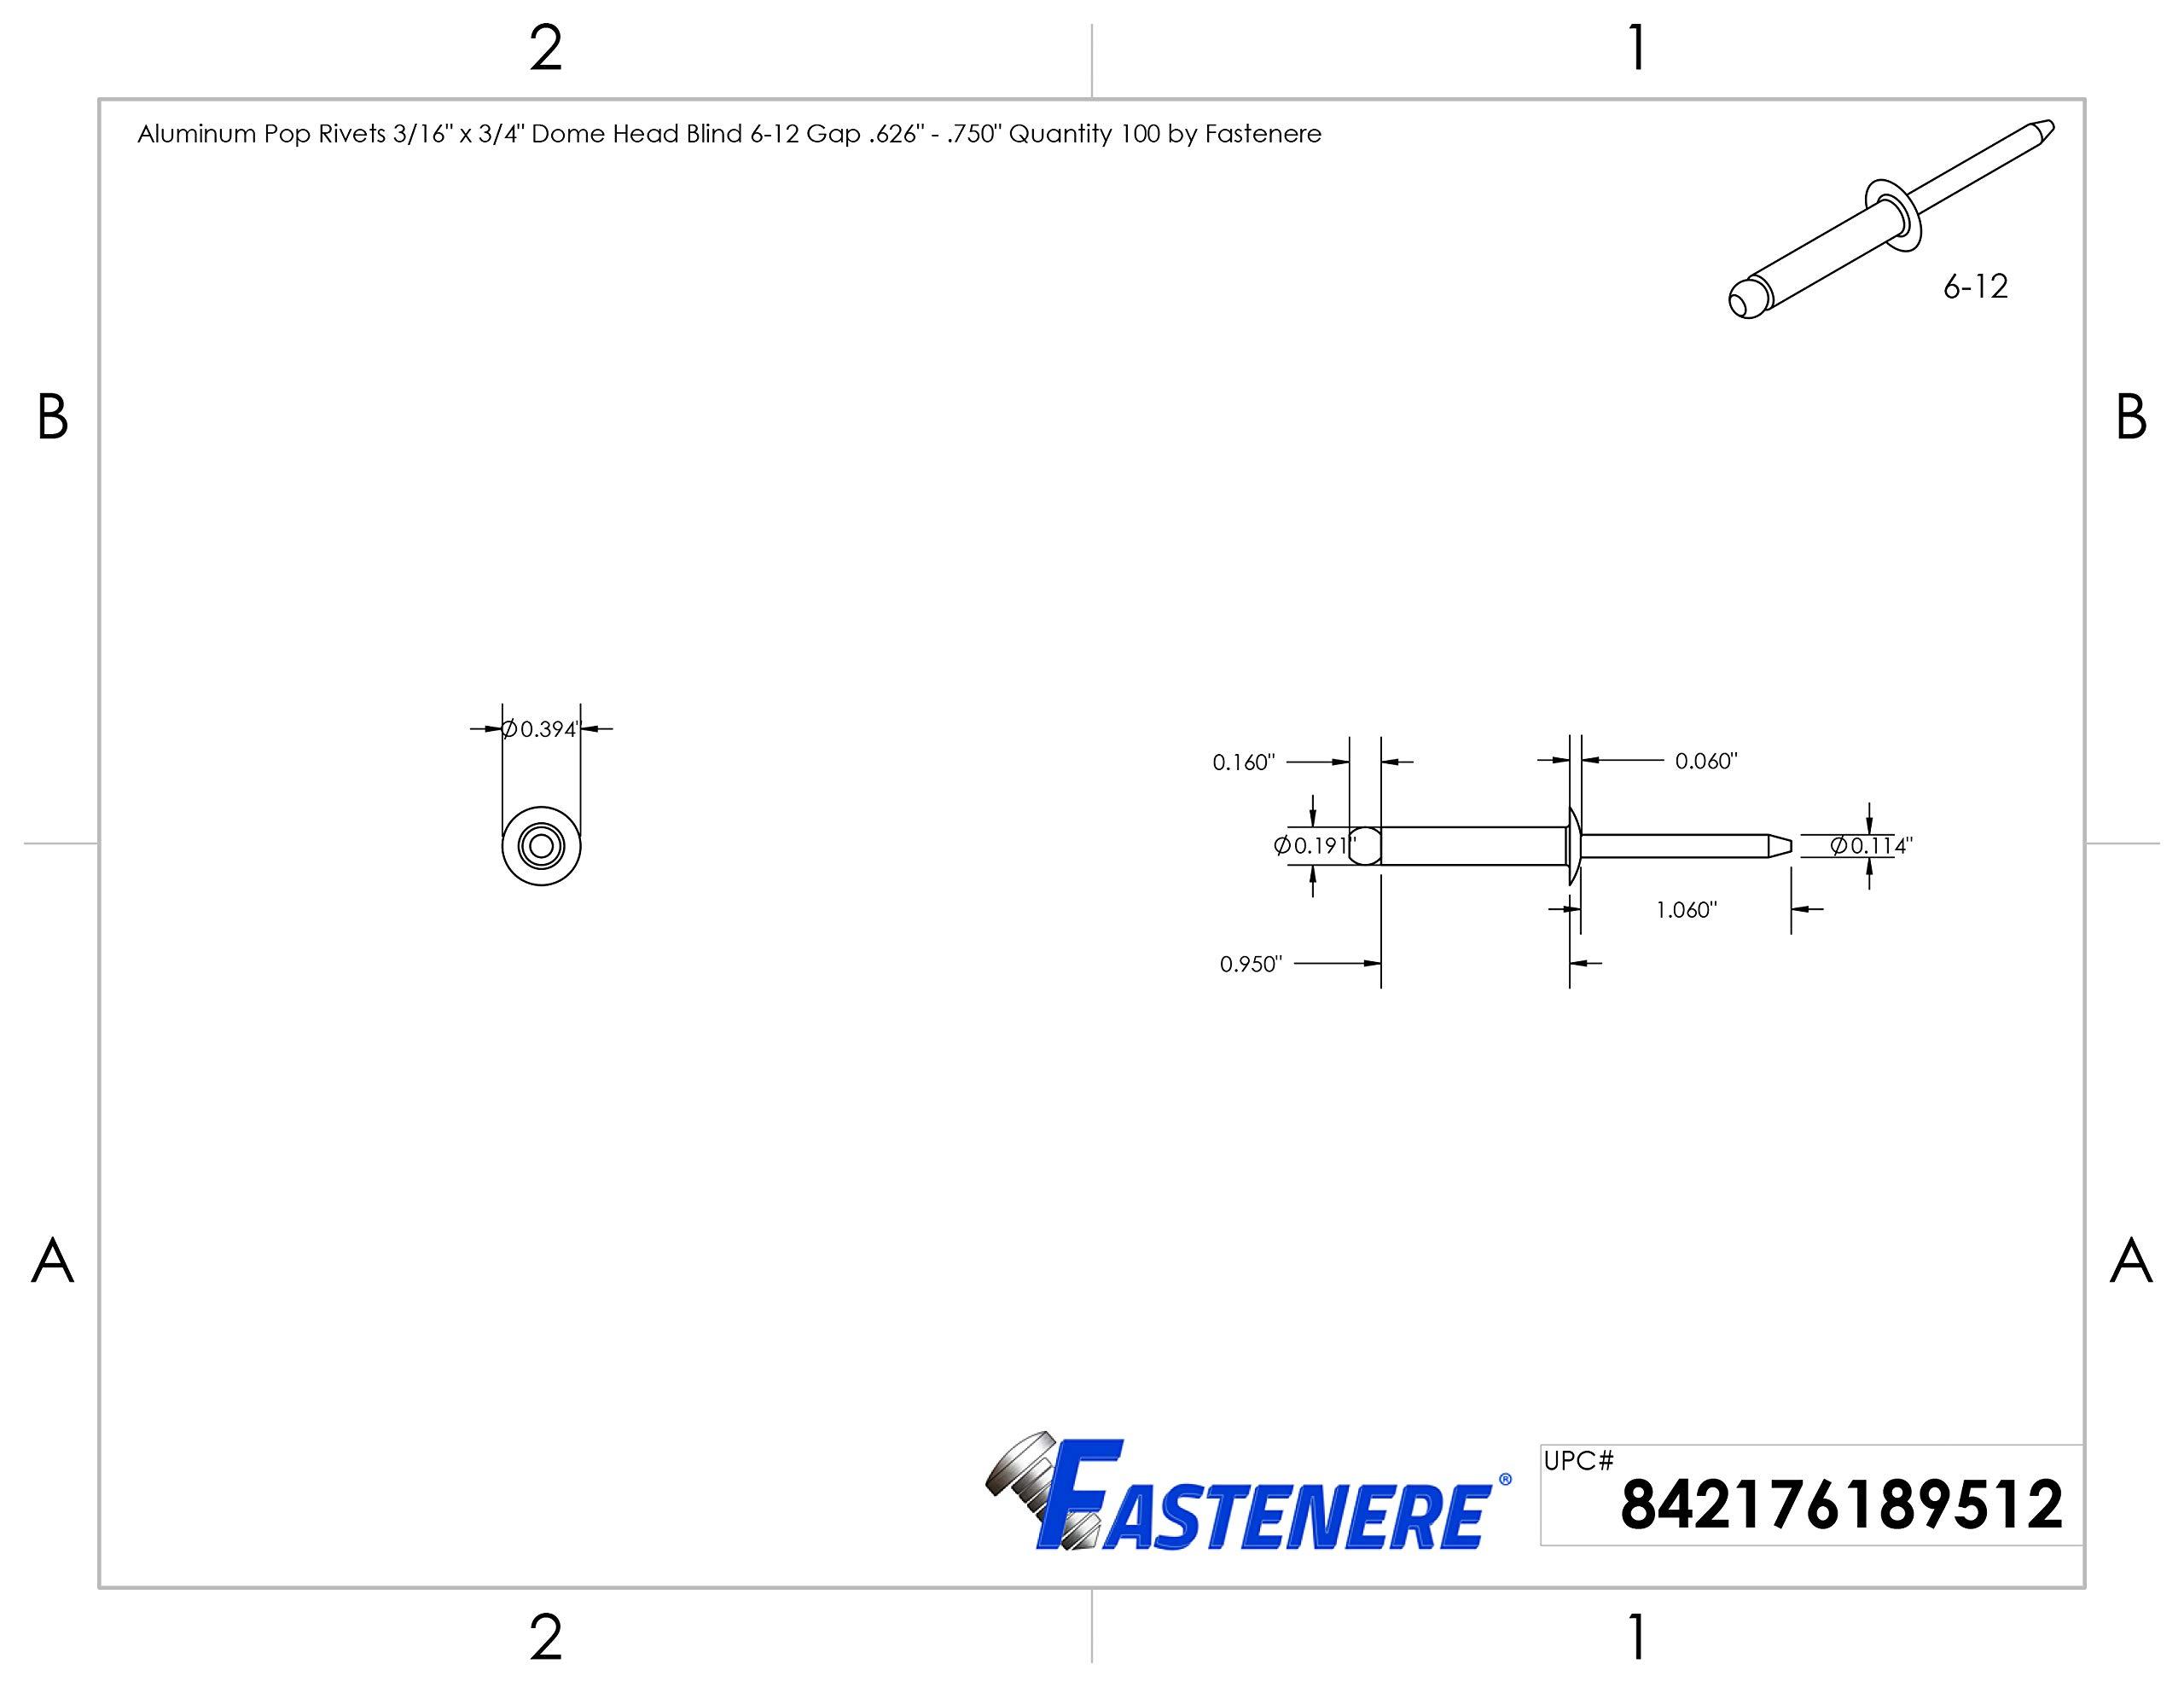 Aluminum Pop Rivets 3/16'' x 3/4'' Dome Head Blind 6-12 Gap .626'' - .750'' Quantity 50 by Fastenere